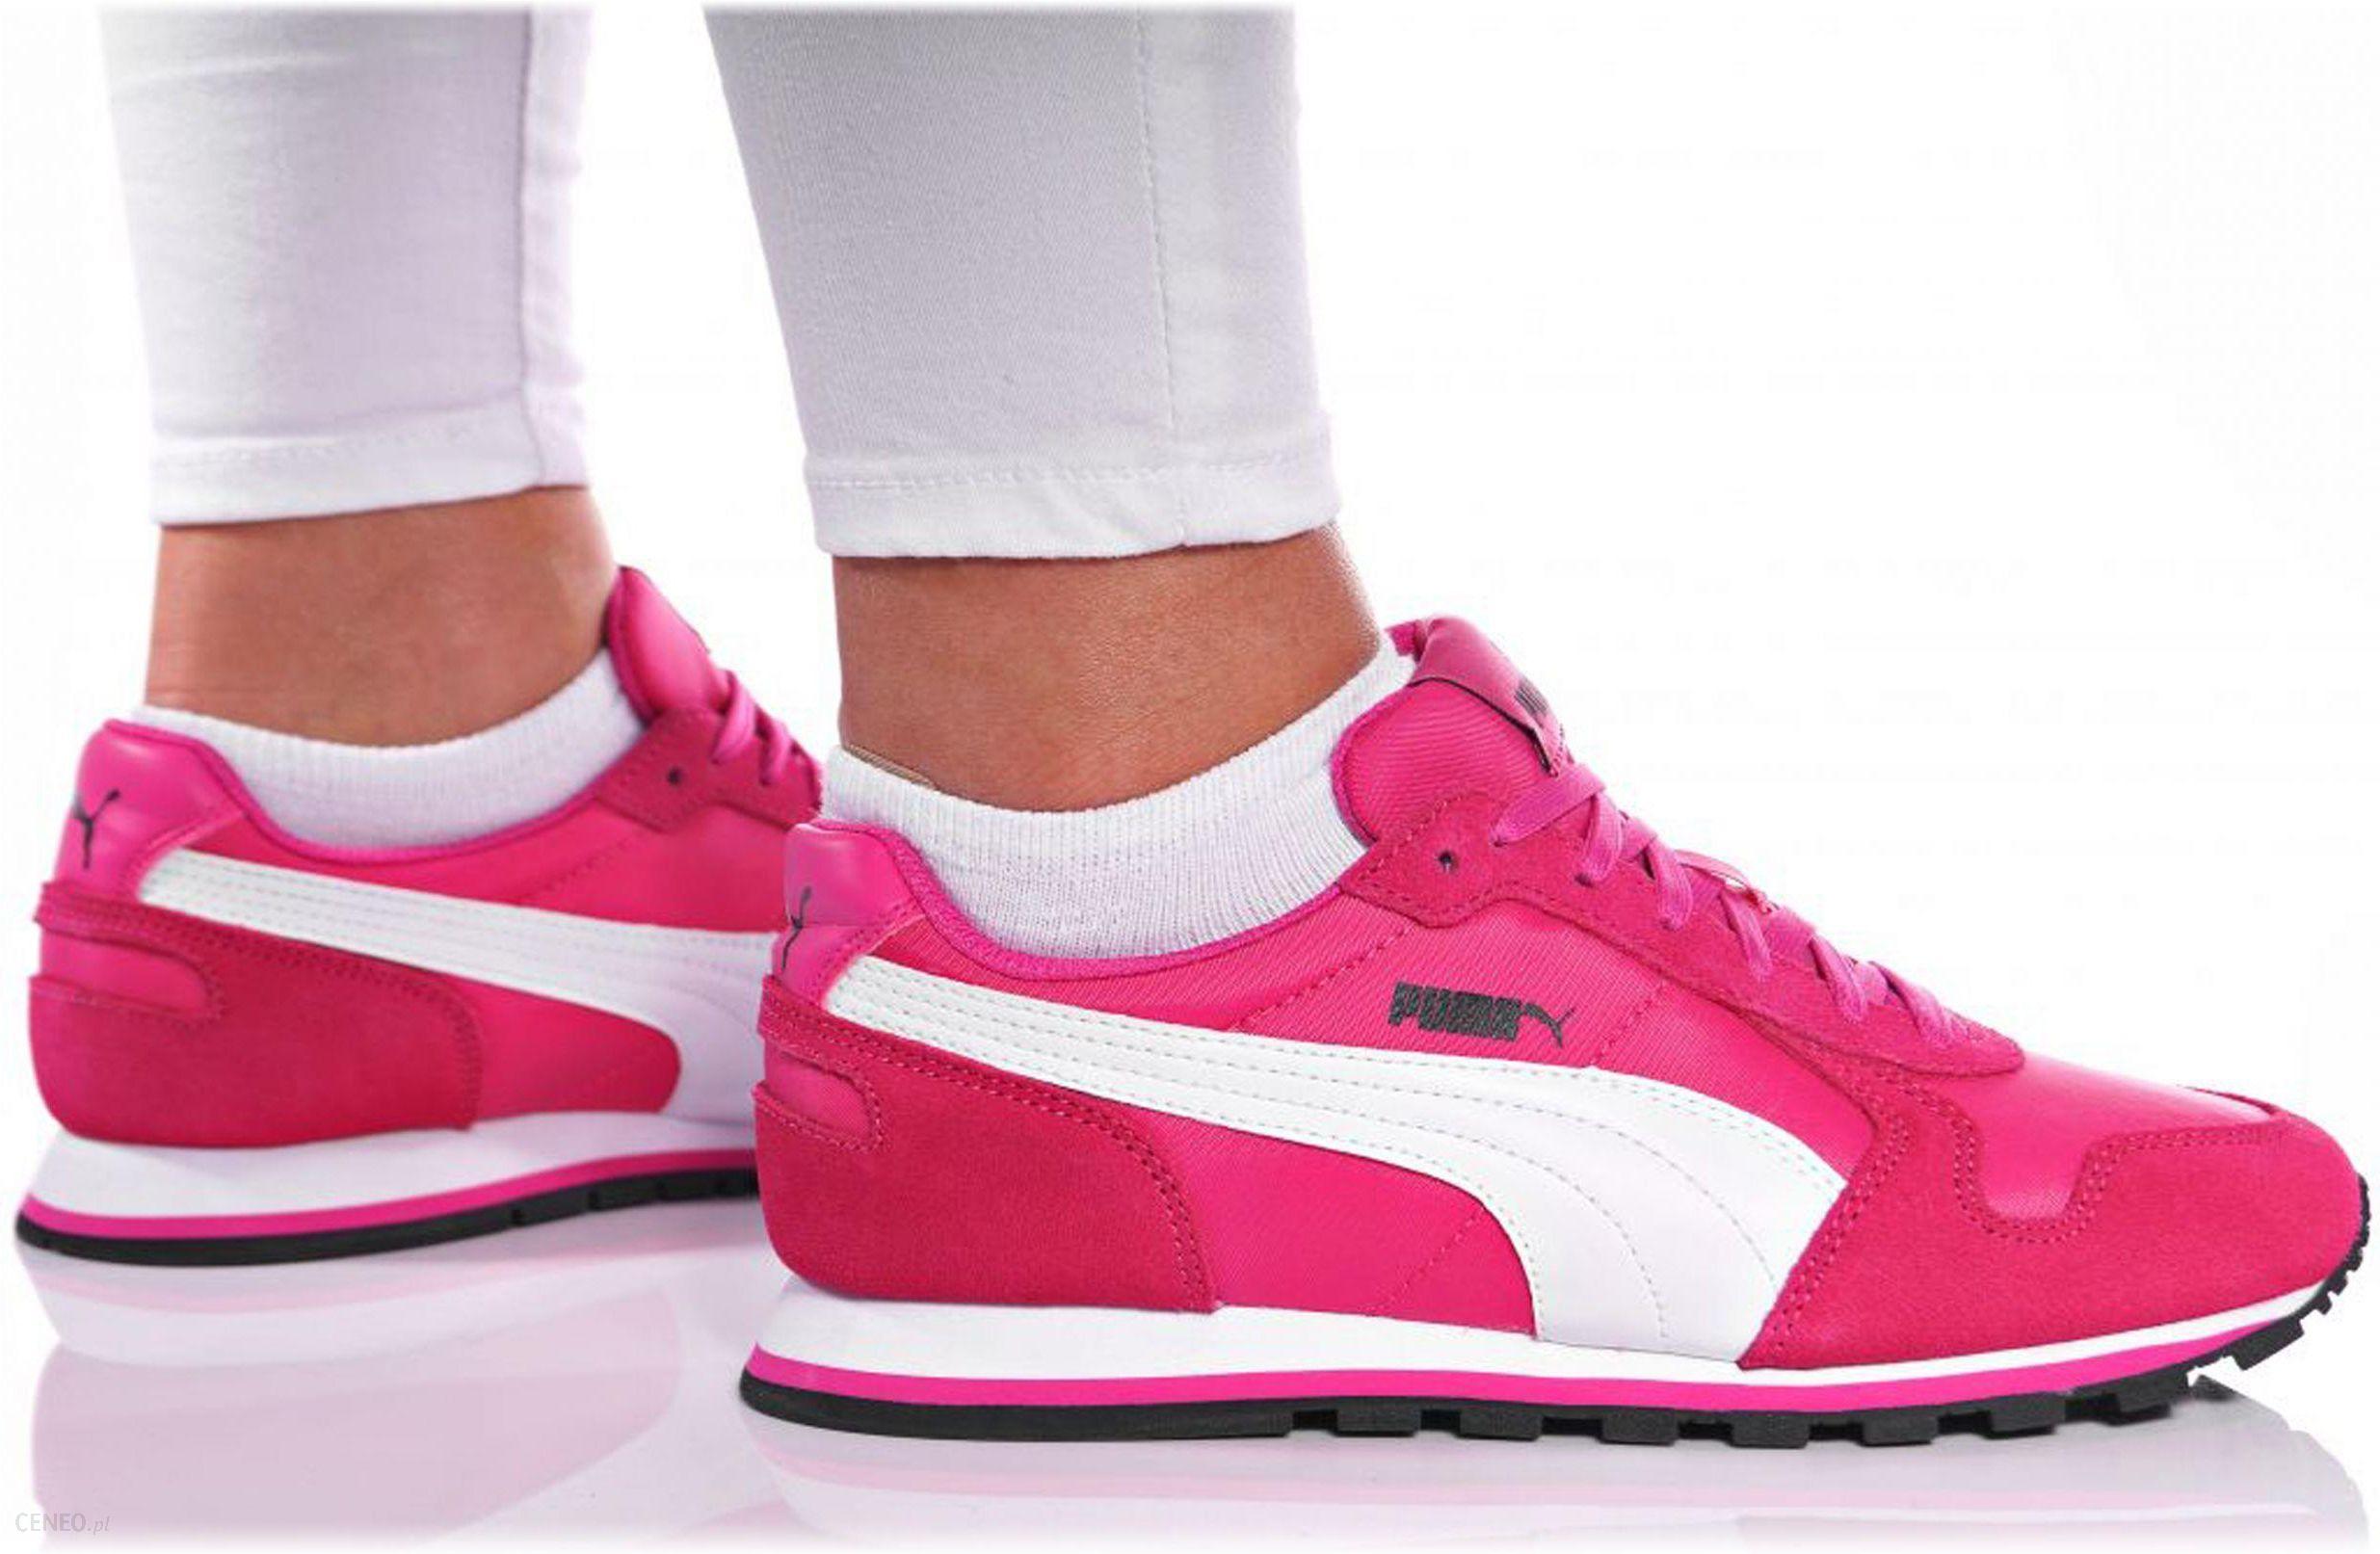 80a2edd1 Buty Puma Damskie St Runner Nl 356738 39 Różowe - Ceny i opinie ...